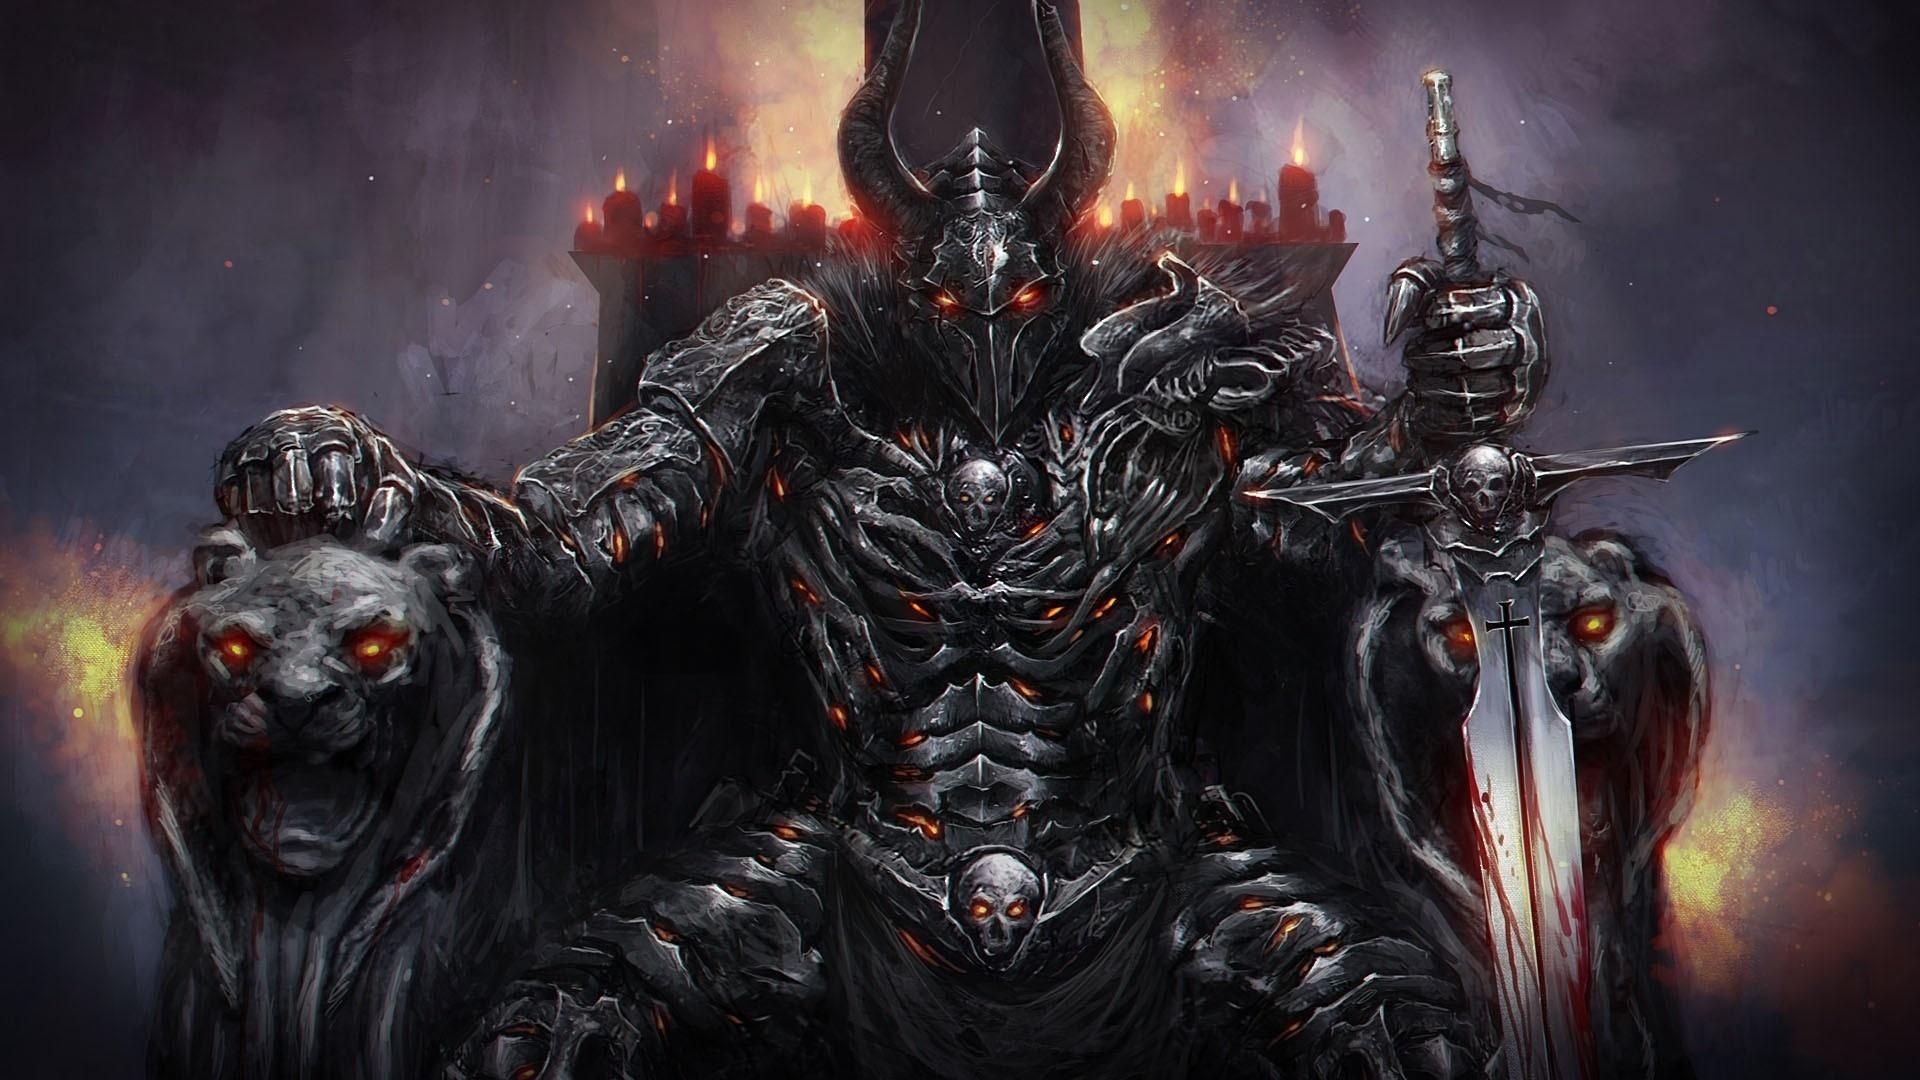 Картинки злого воина